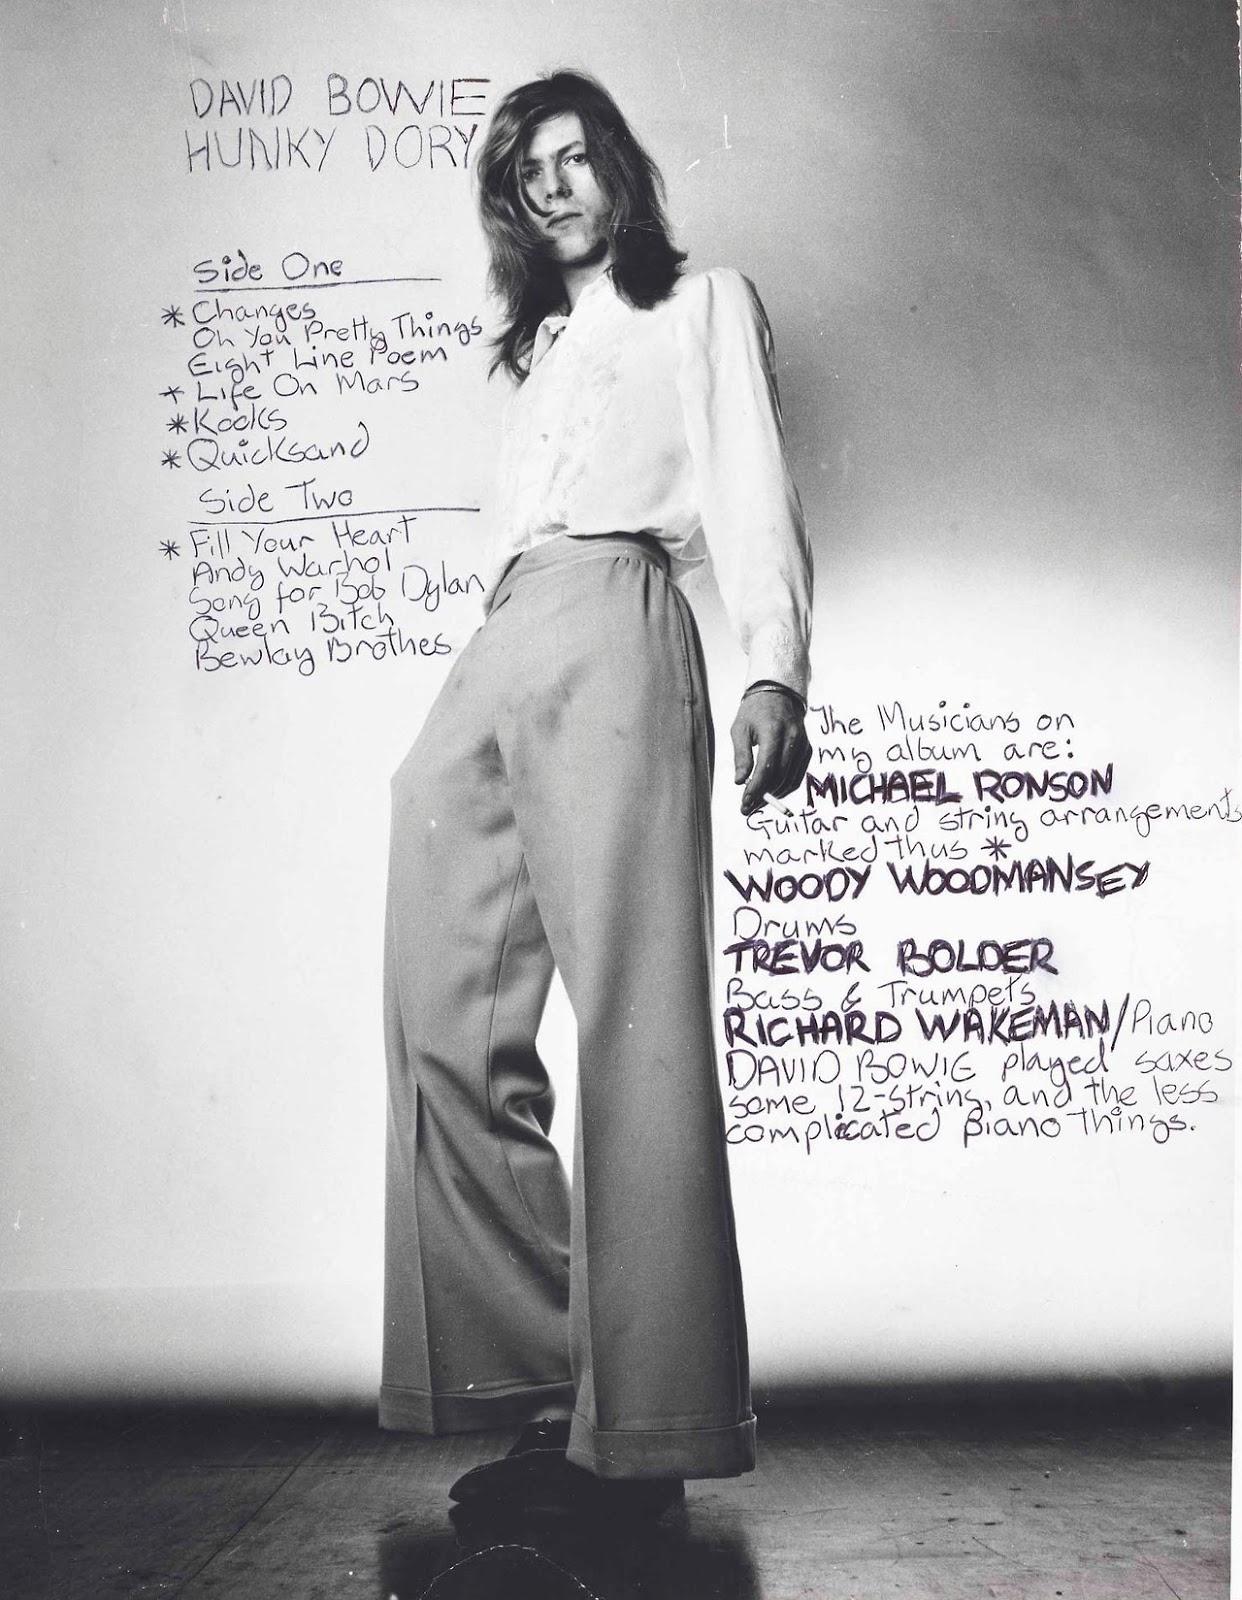 David Bowie 1971 Vintage Everyday